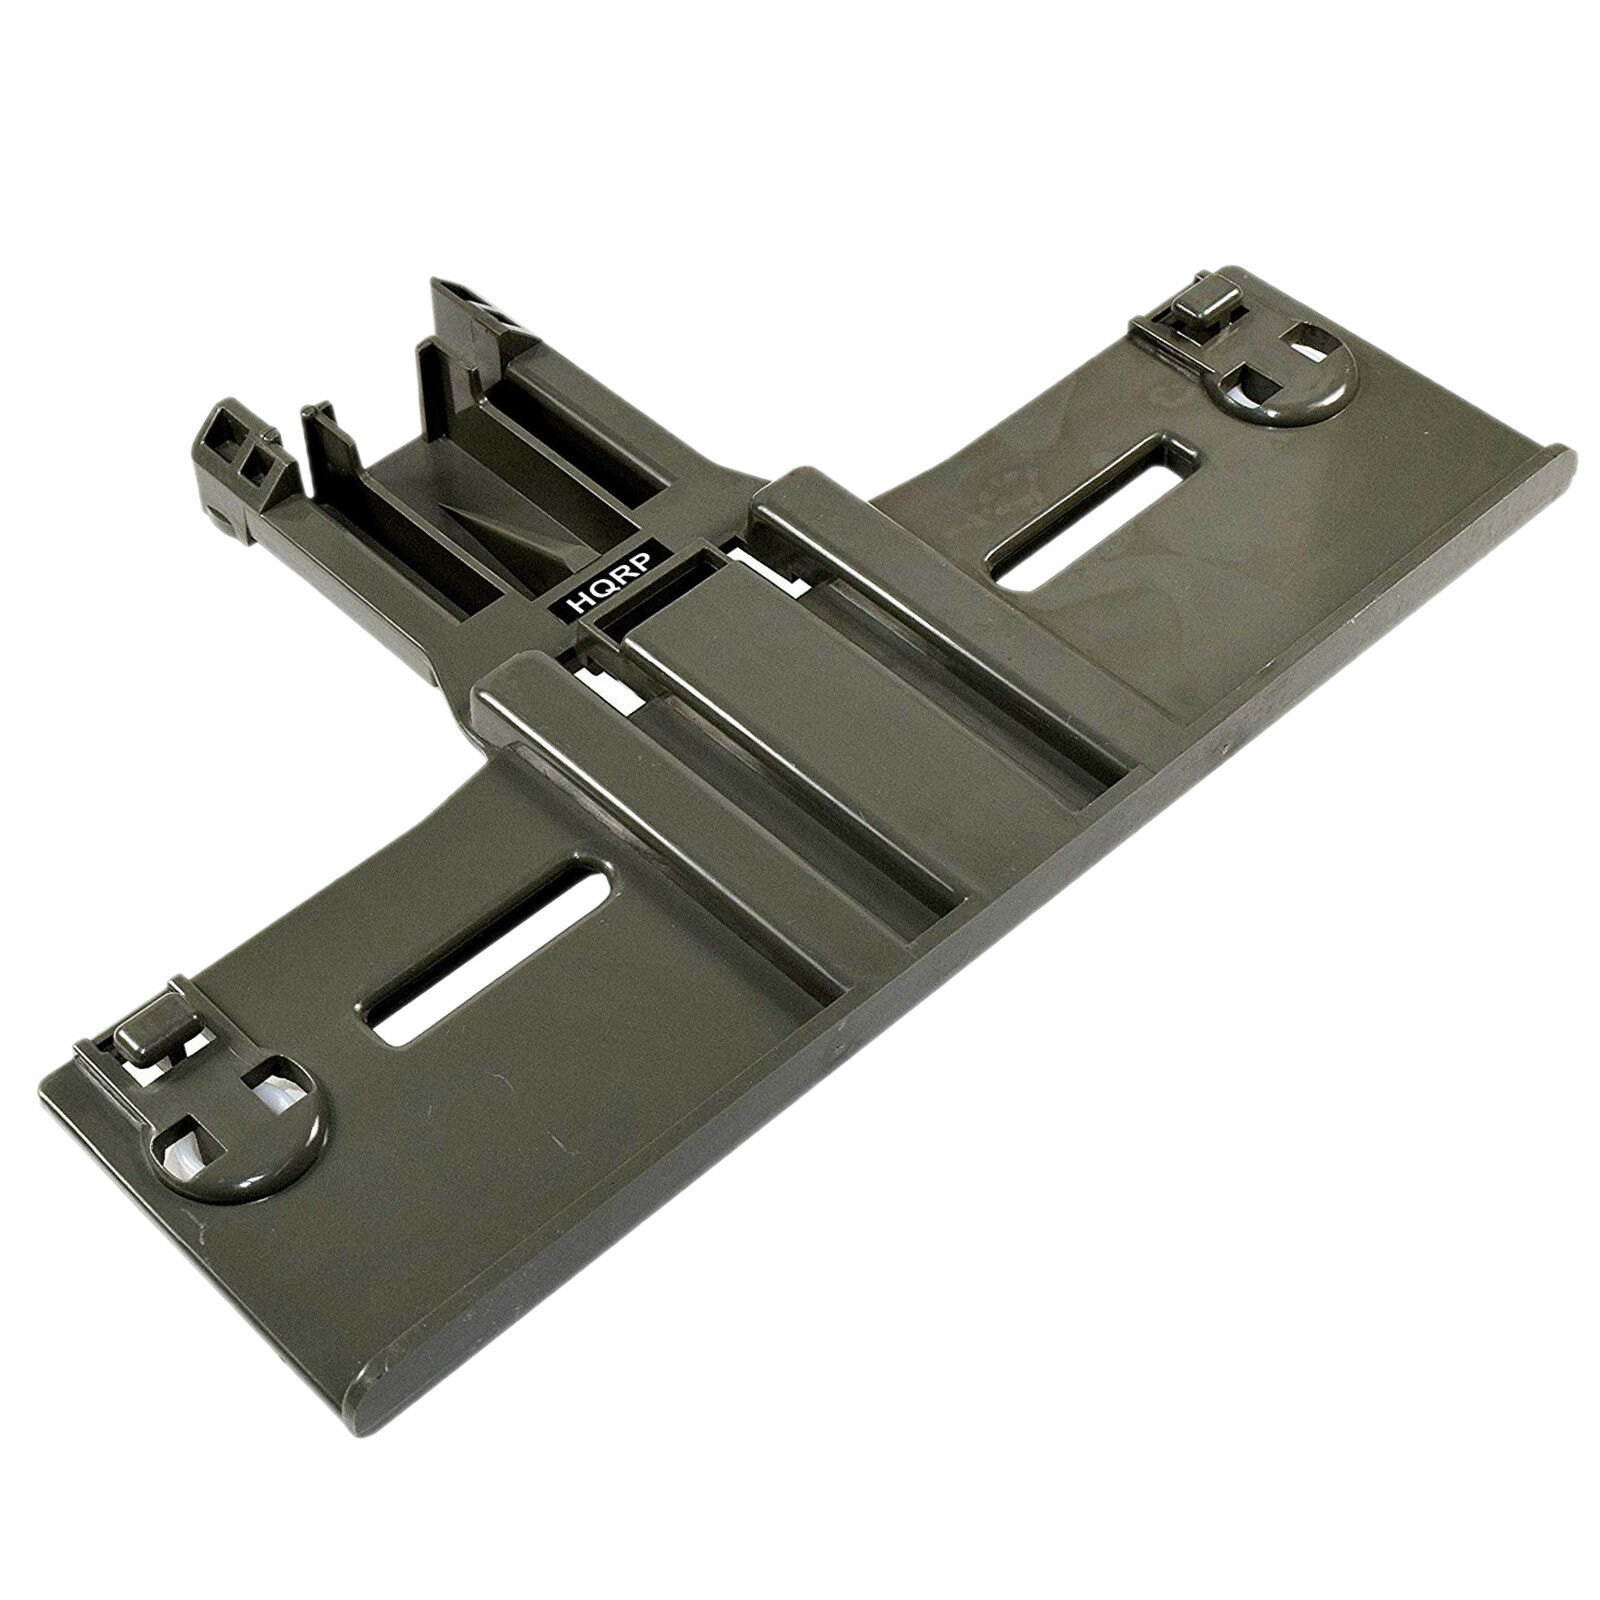 HQRP Rack Adjuster for Kenmore 66213 66512 66513 66514 66515